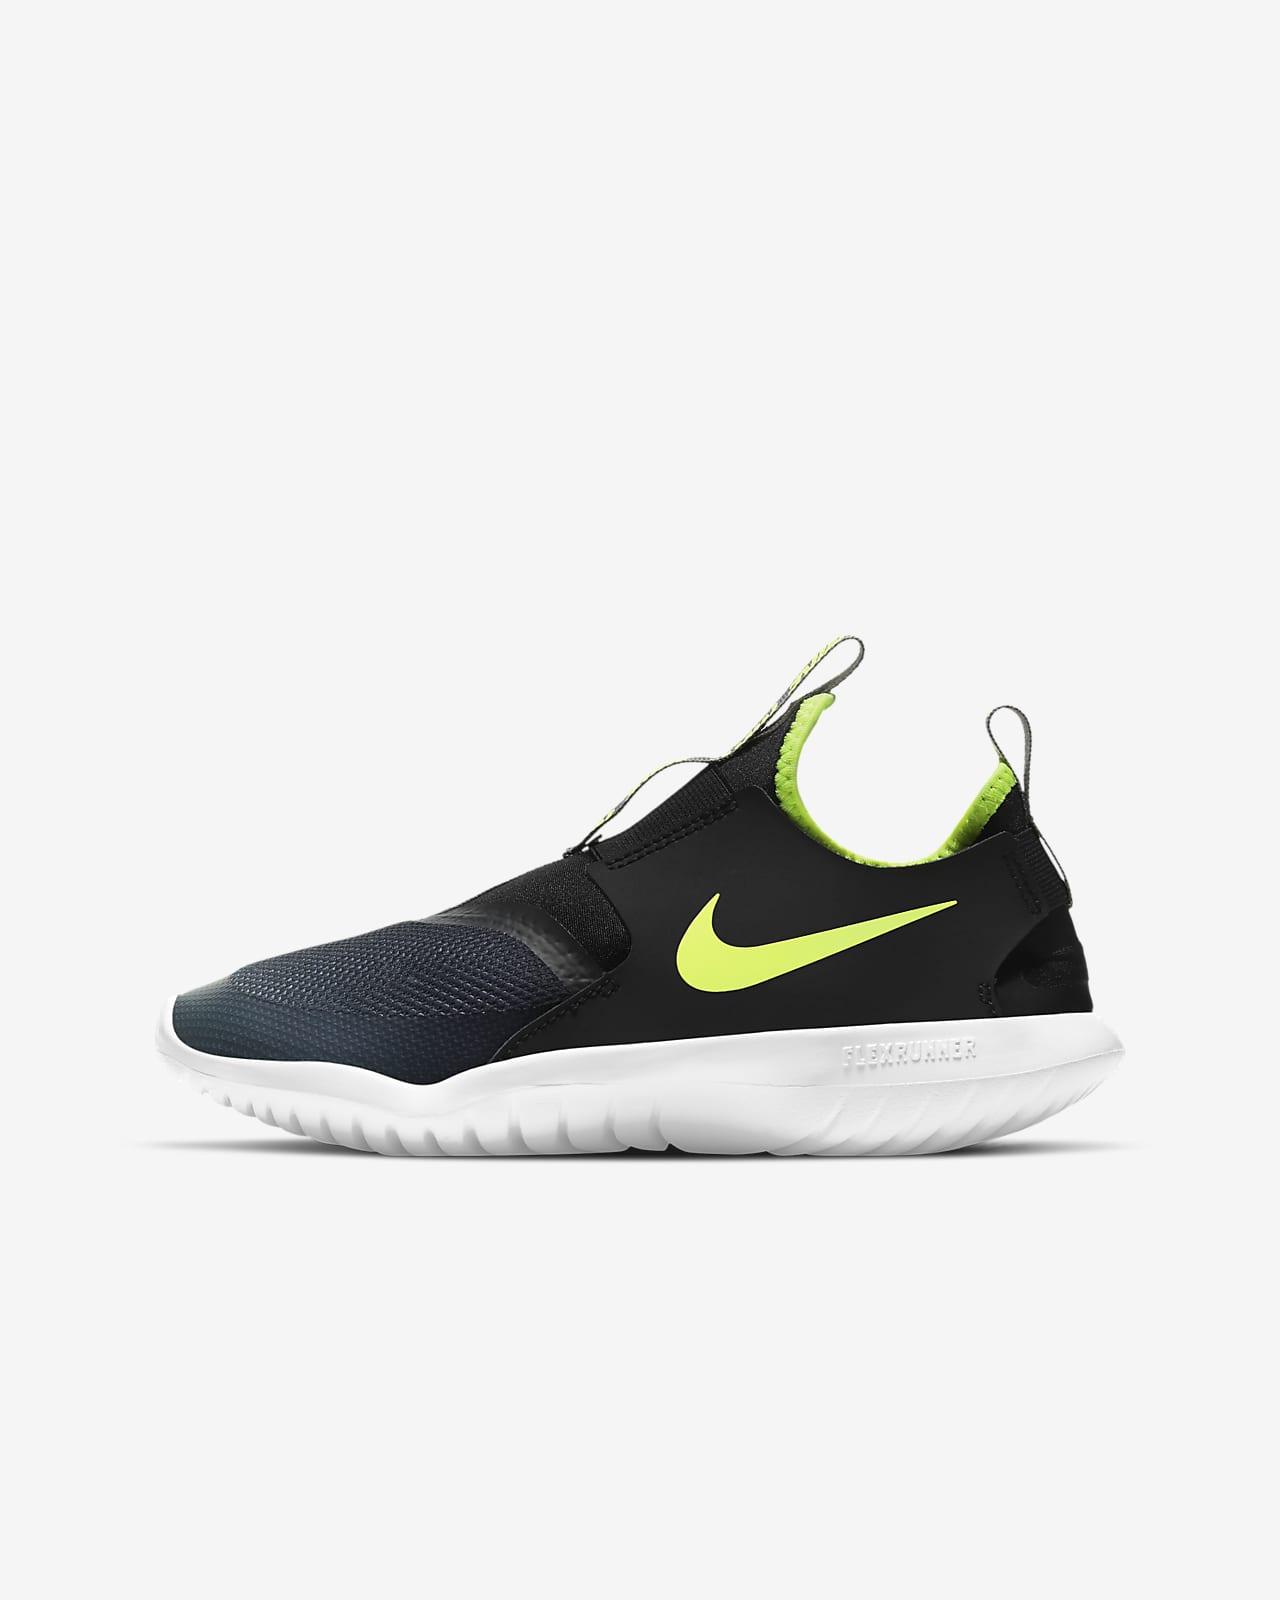 Calzado de running para carretera para niños talla grande Nike Flex Runners